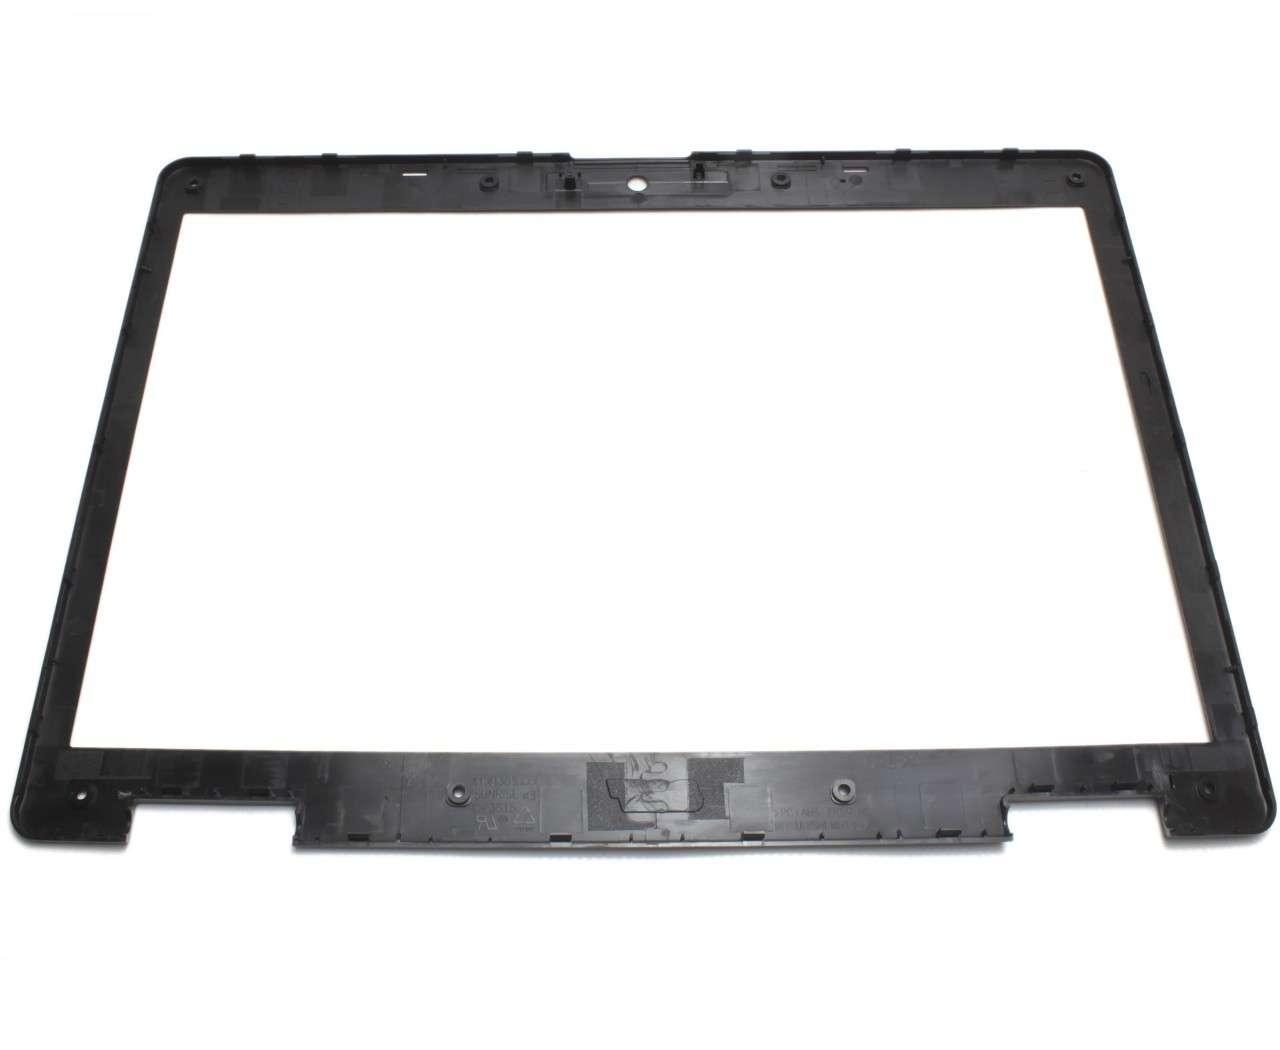 Rama Display Acer TravelMate 5710G Bezel Front Cover Neagra imagine